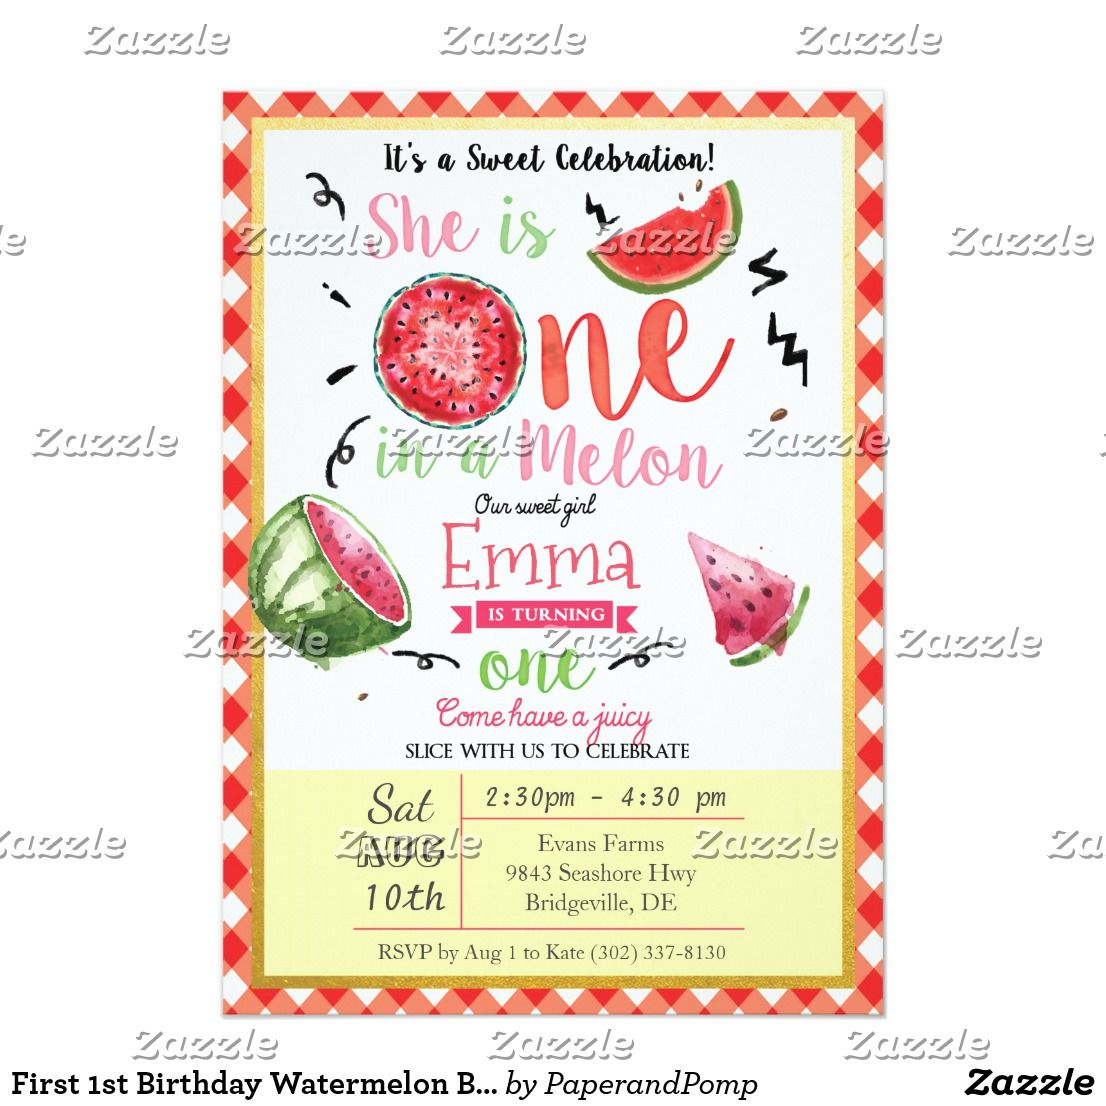 First 1st birthday watermelon birthday invitation watermelon first 1st birthday watermelon birthday invitation filmwisefo